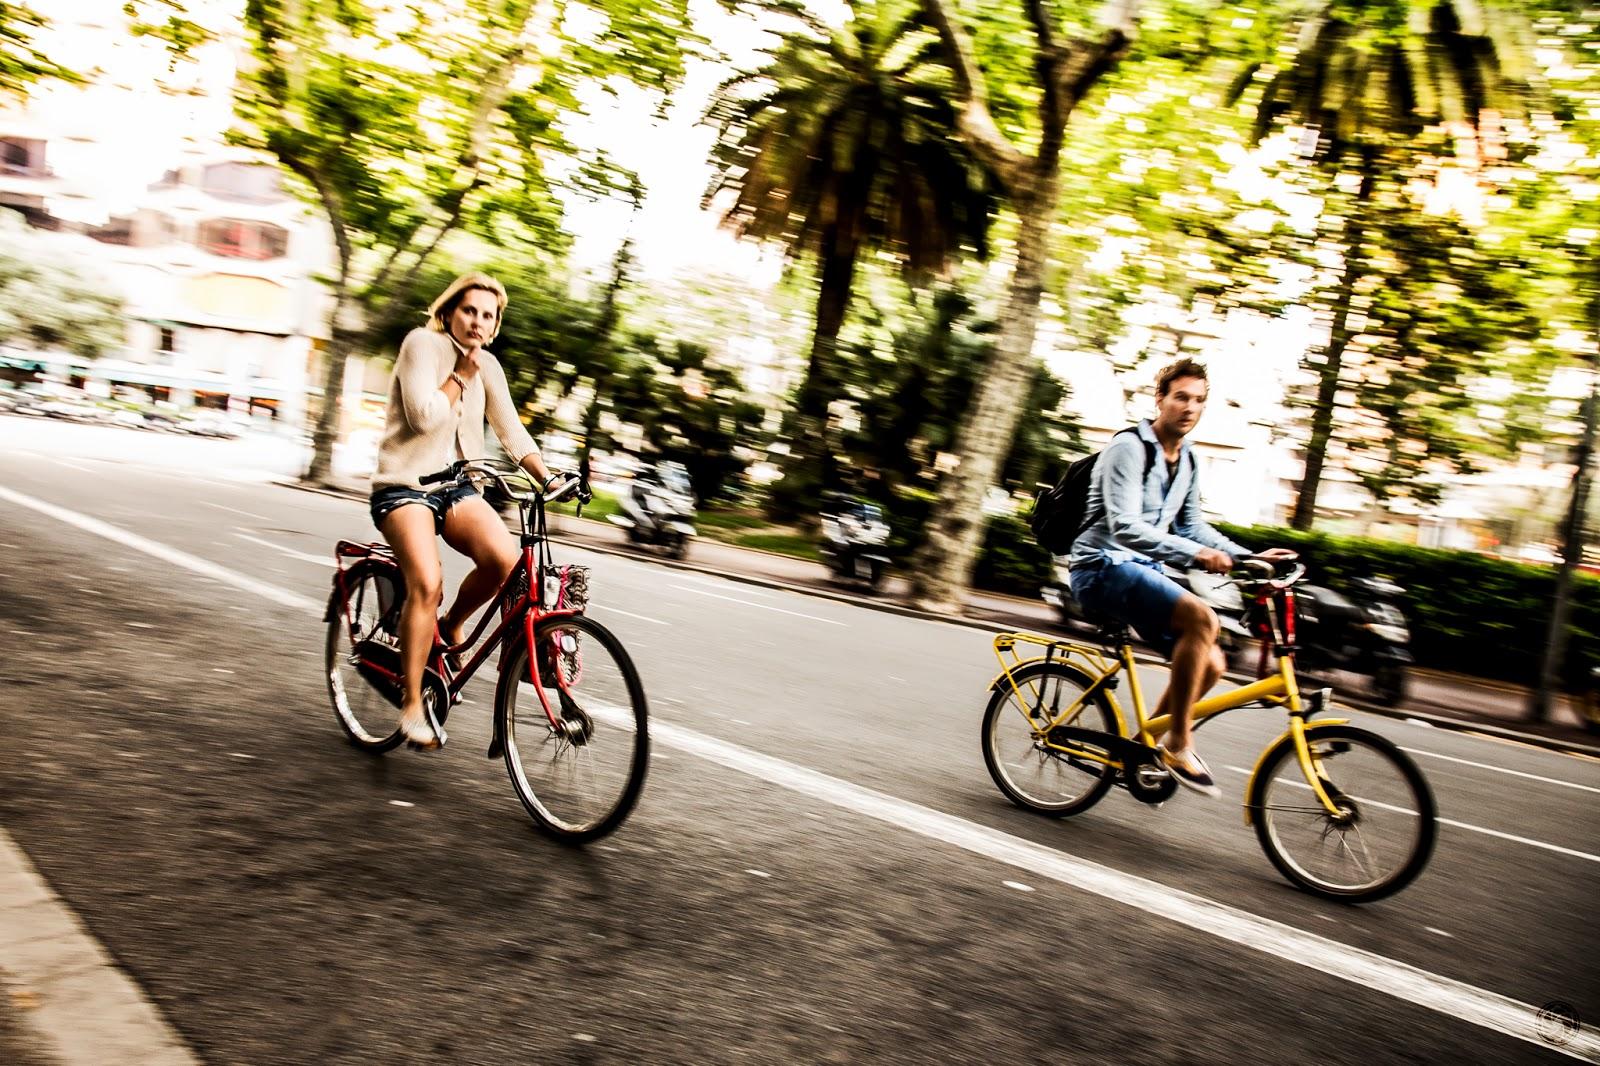 Easy Rider - Cuatro ruedas :: Canon EOS 5D MkIII | ISO1600 | Canon 24-105 @24mm | f/7,1 | 1/40